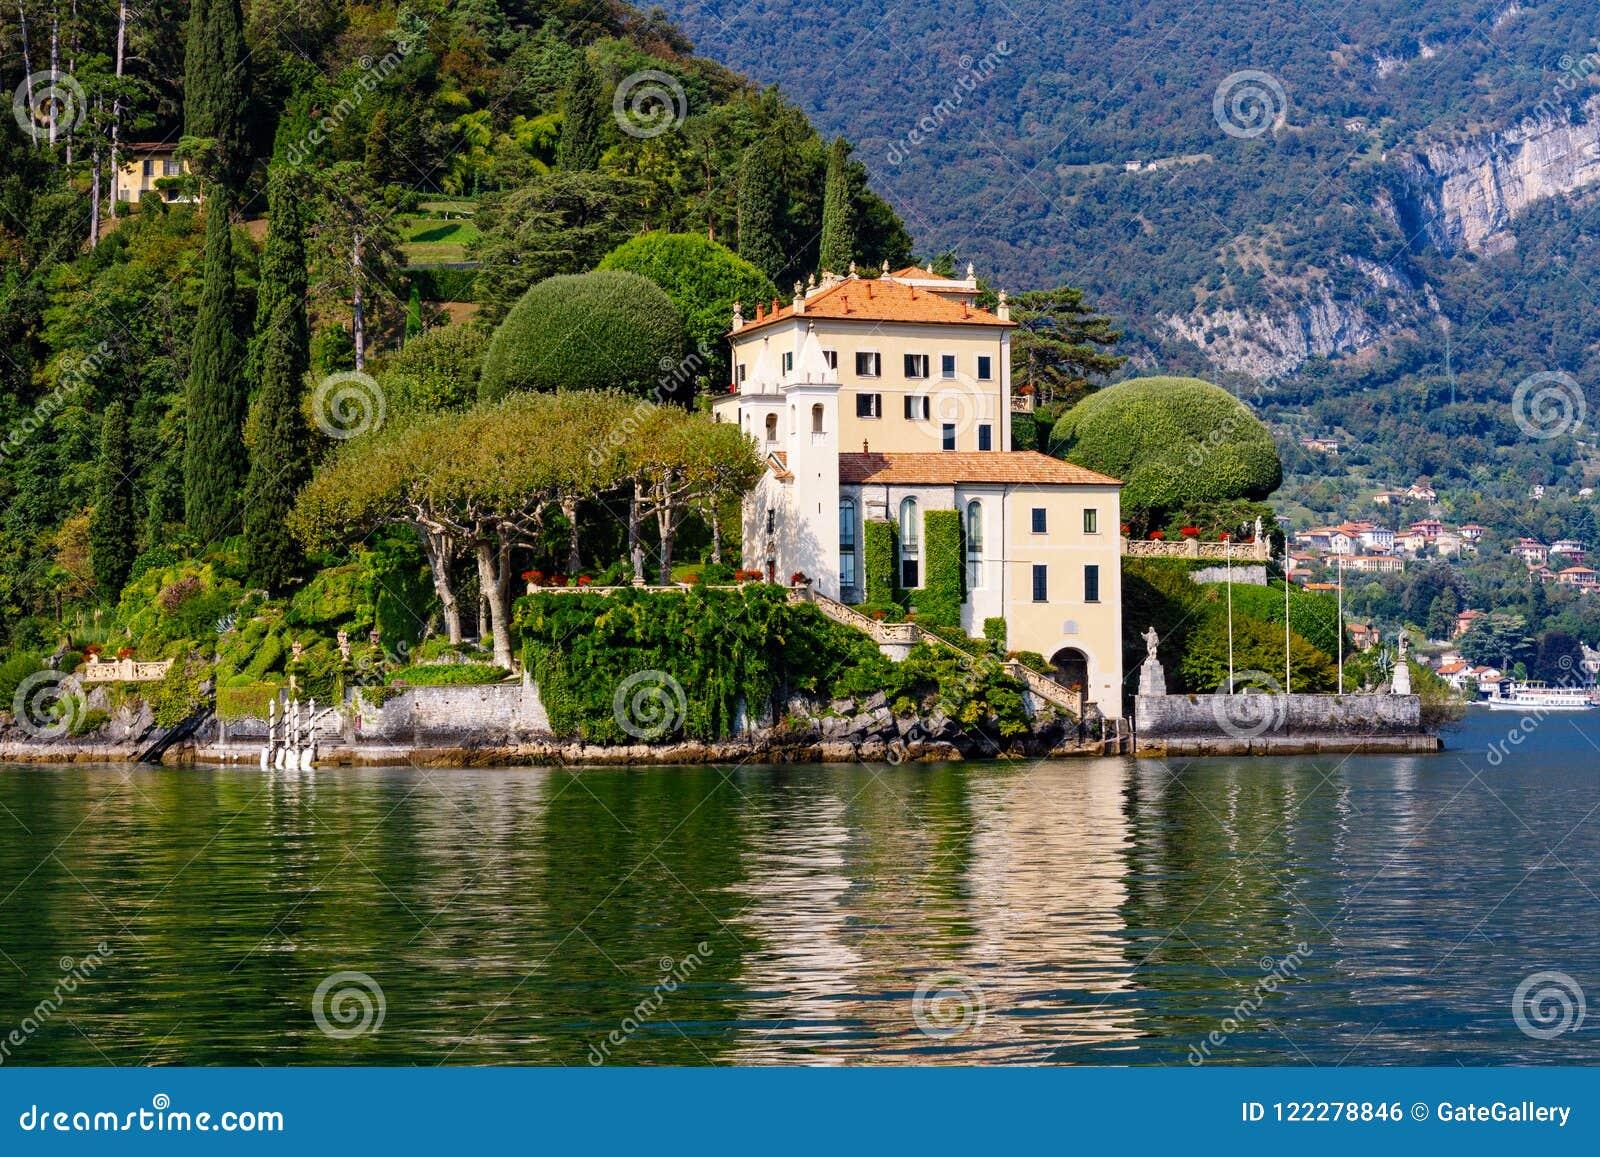 Villa Del Balbianello, Wedding Villa Como Lake